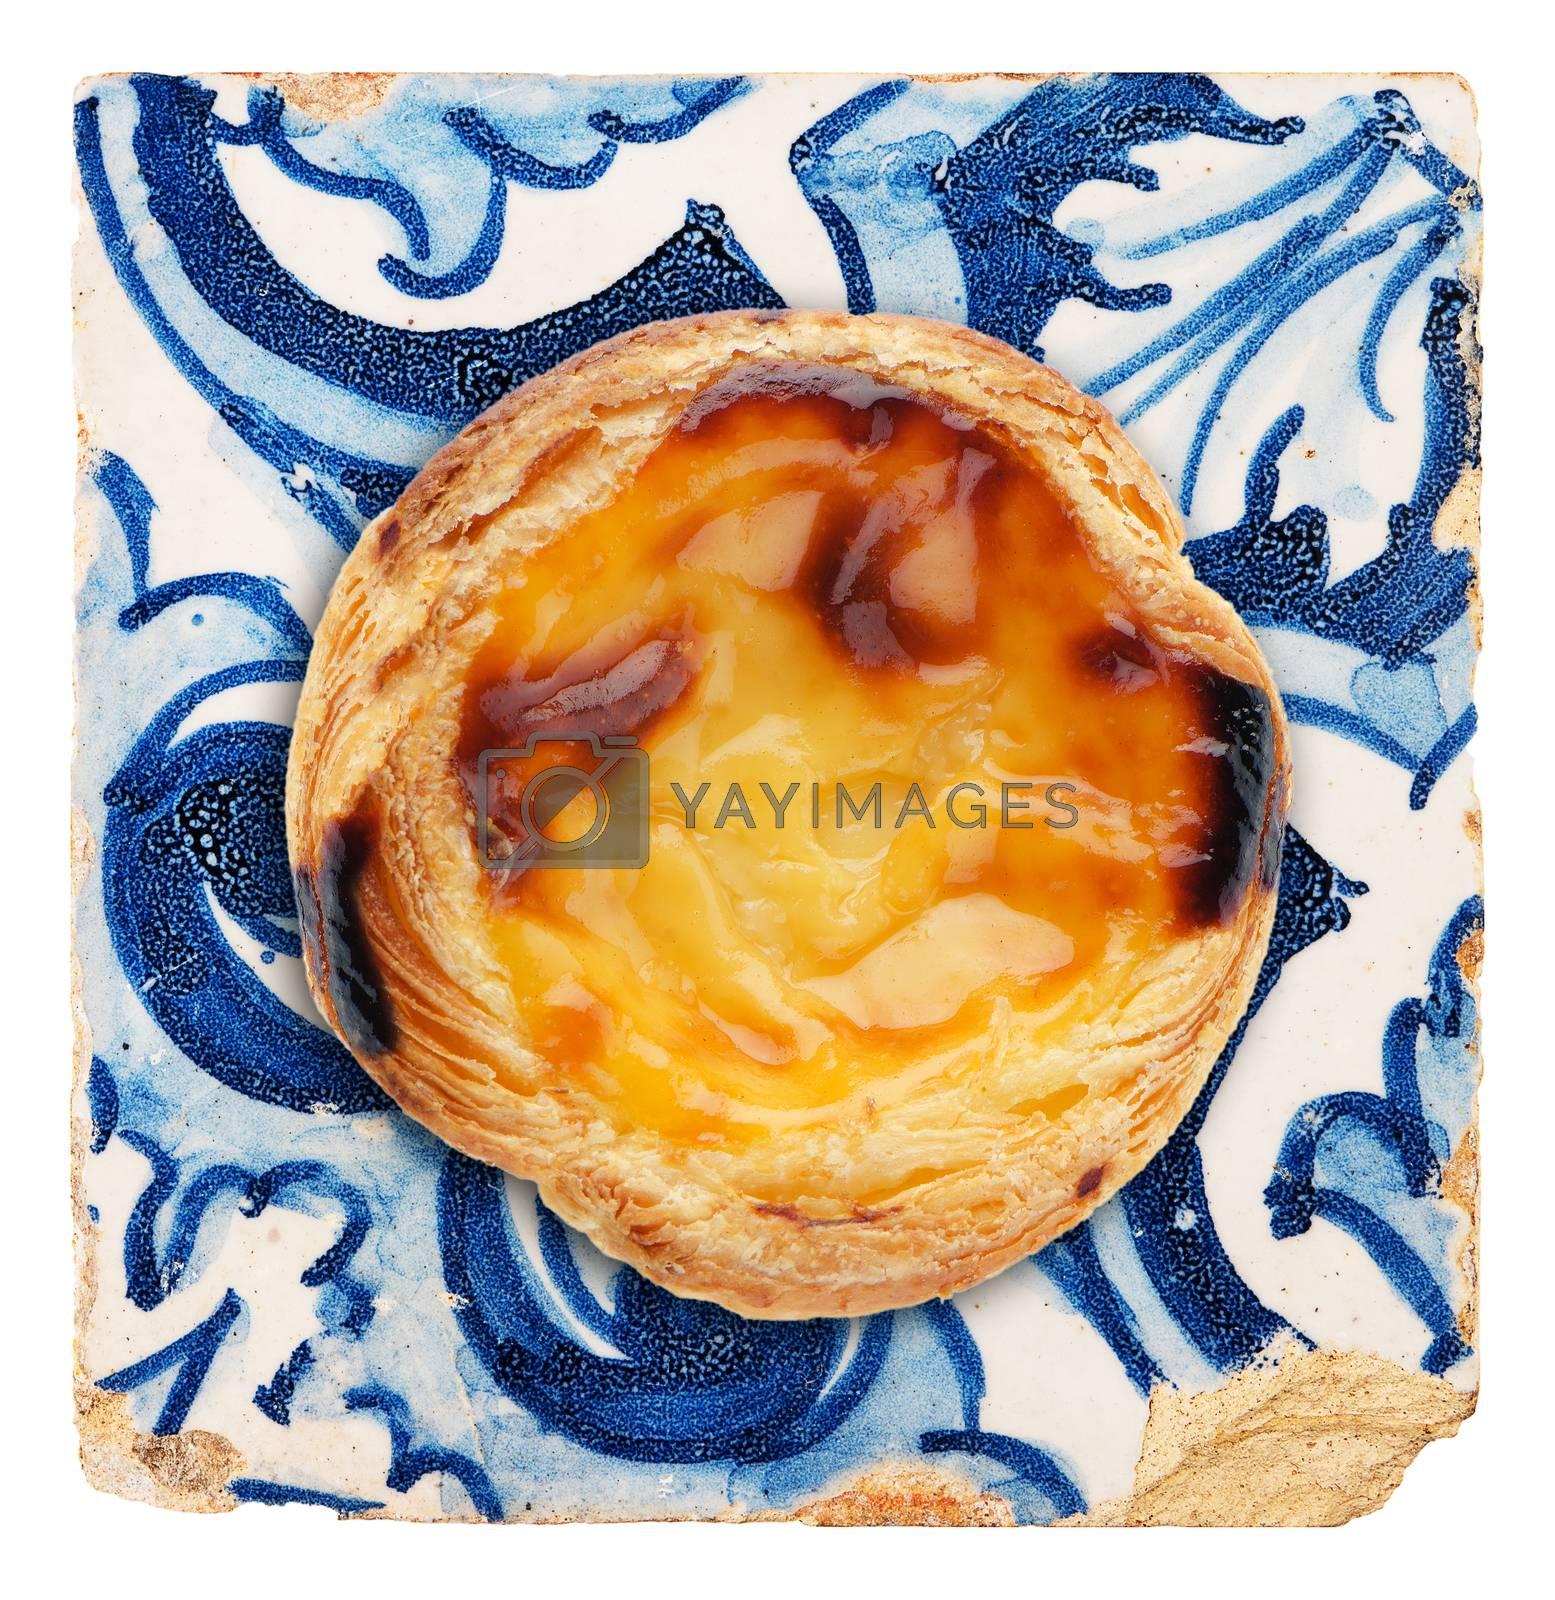 Portuguese dessert pastel de nata on top of old ceramic tile.